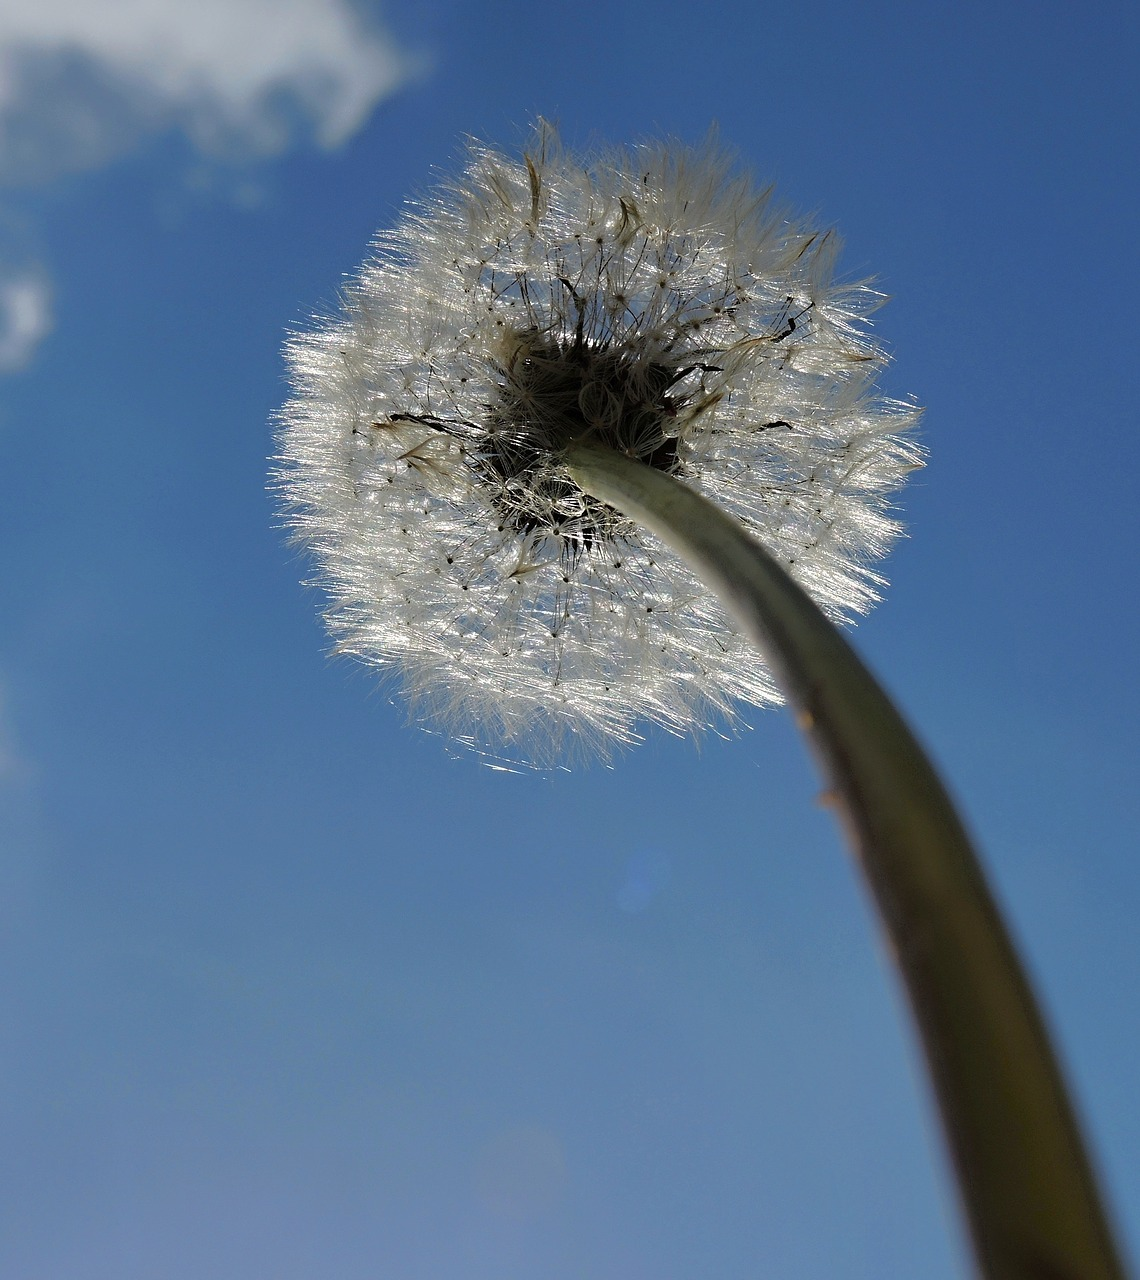 dandelion-1218421_1280.jpg